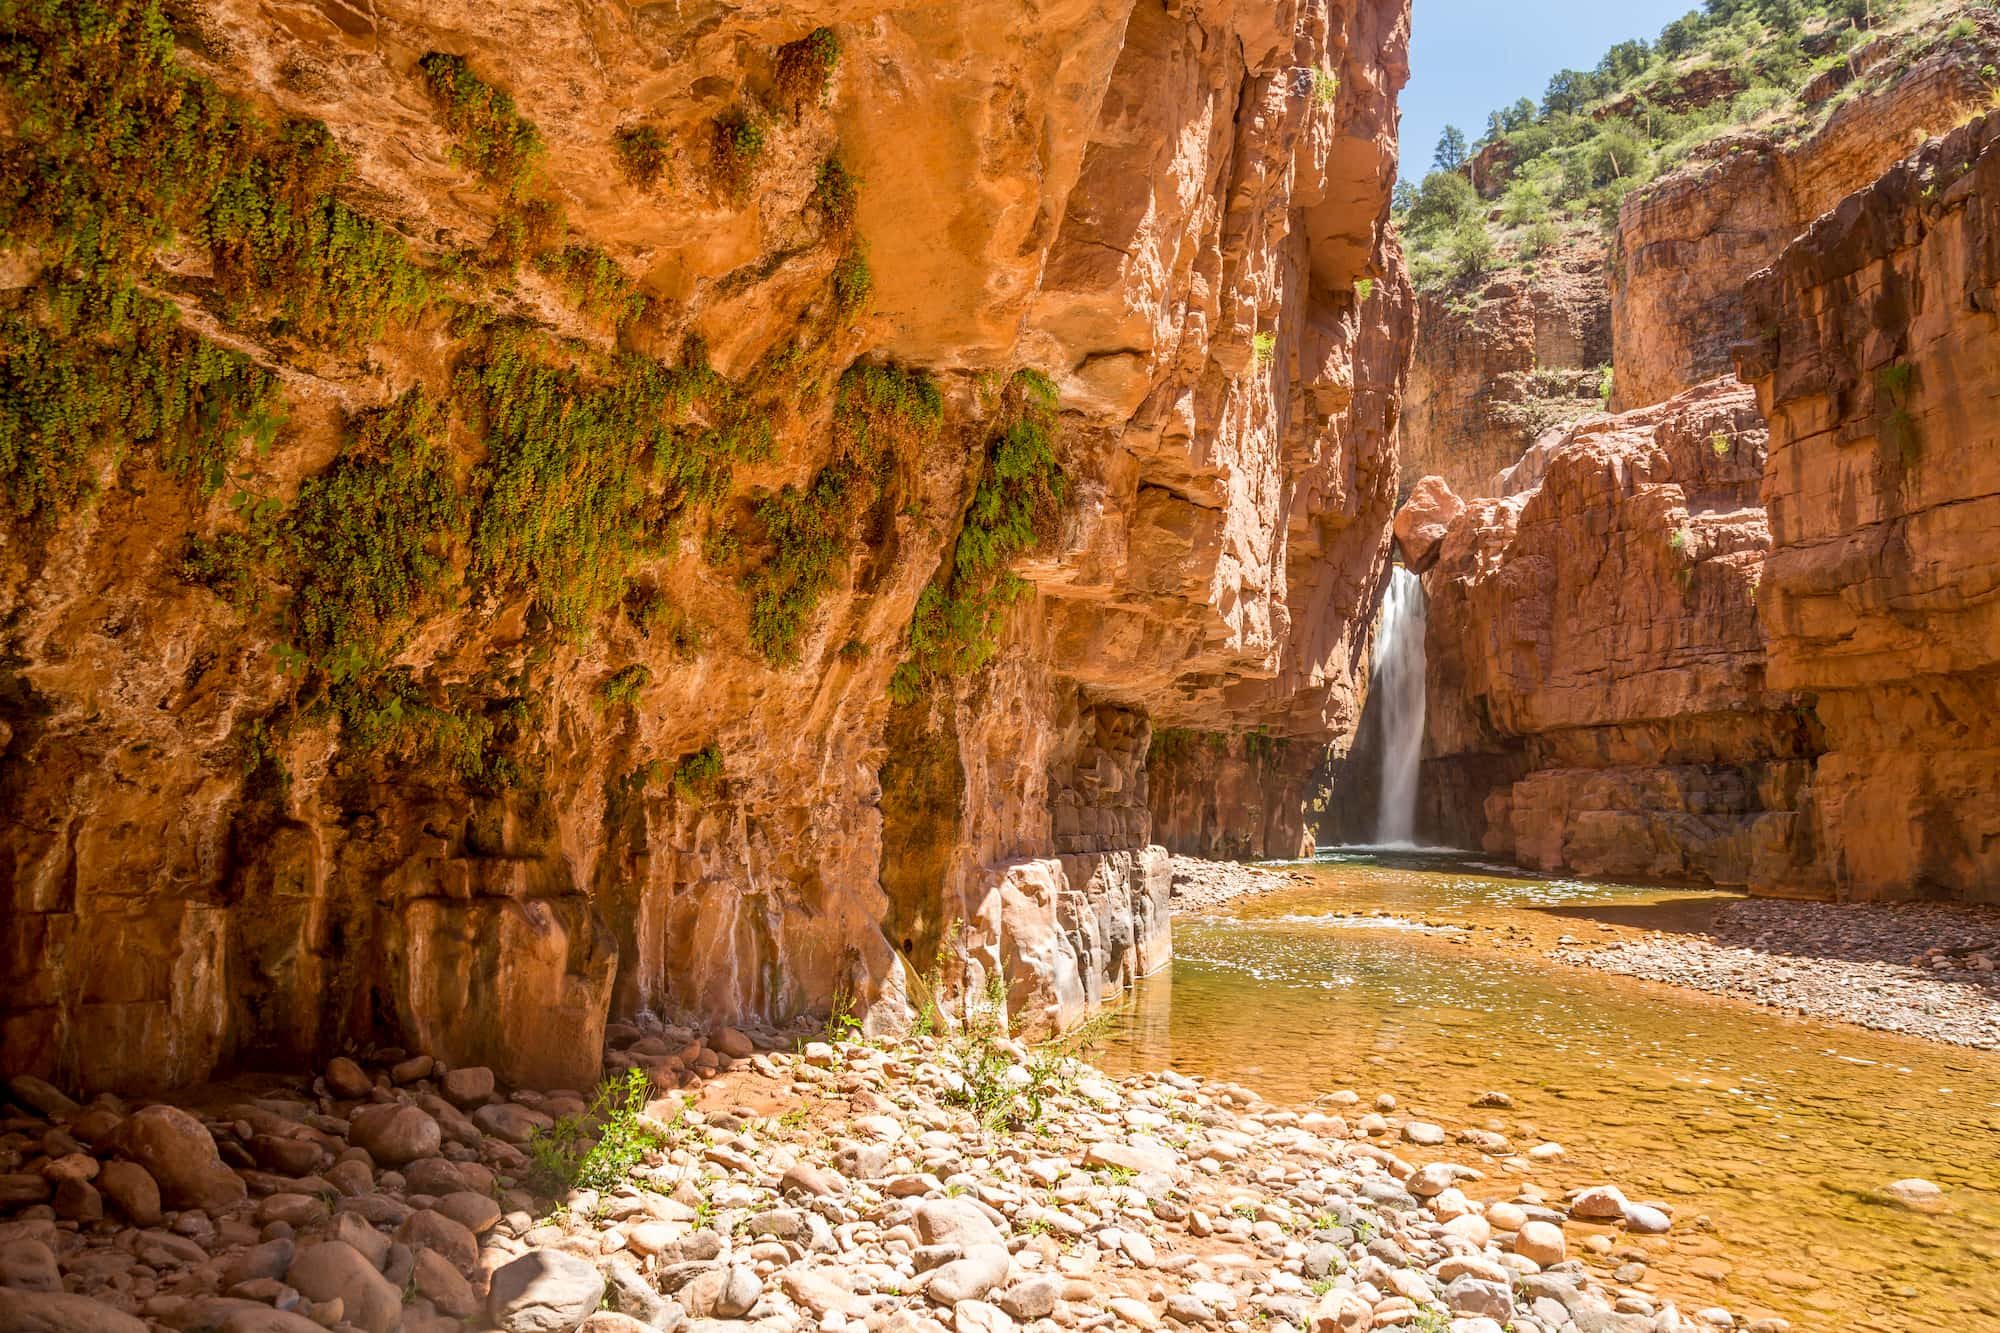 Waterfall flowing between red rock cliffs.